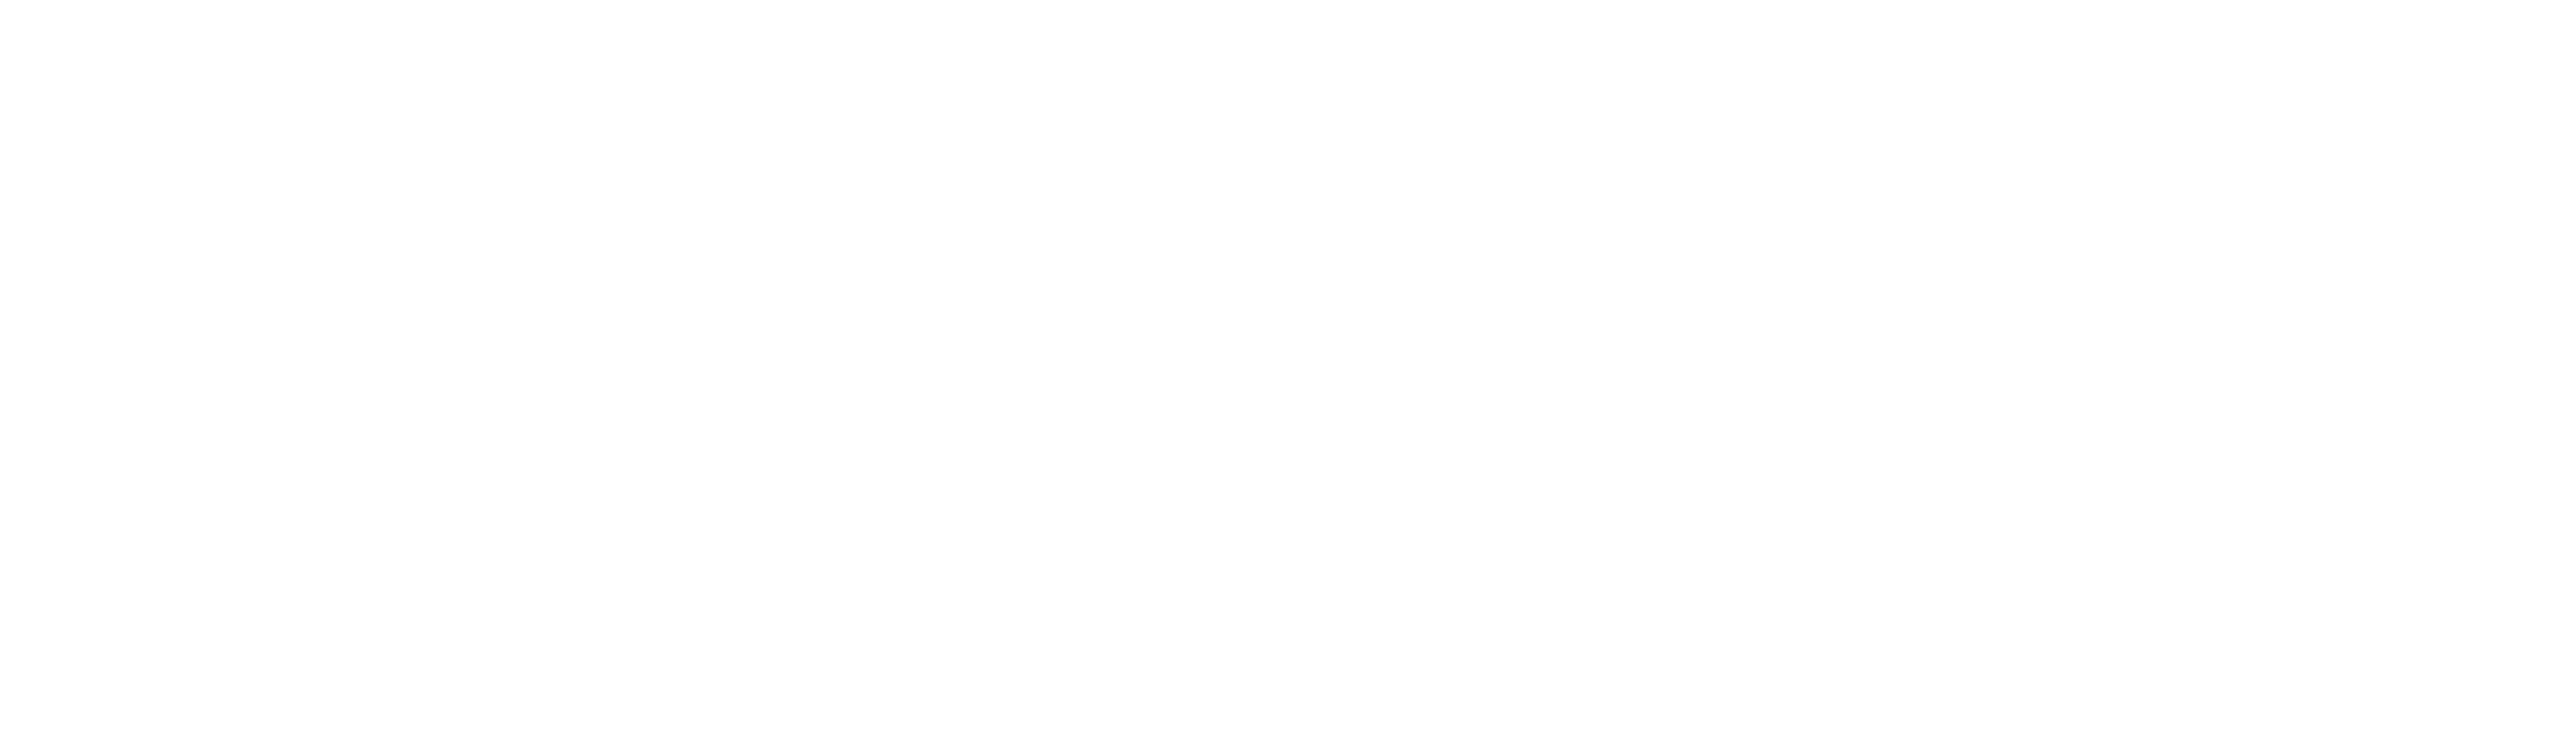 IABM 3 - White